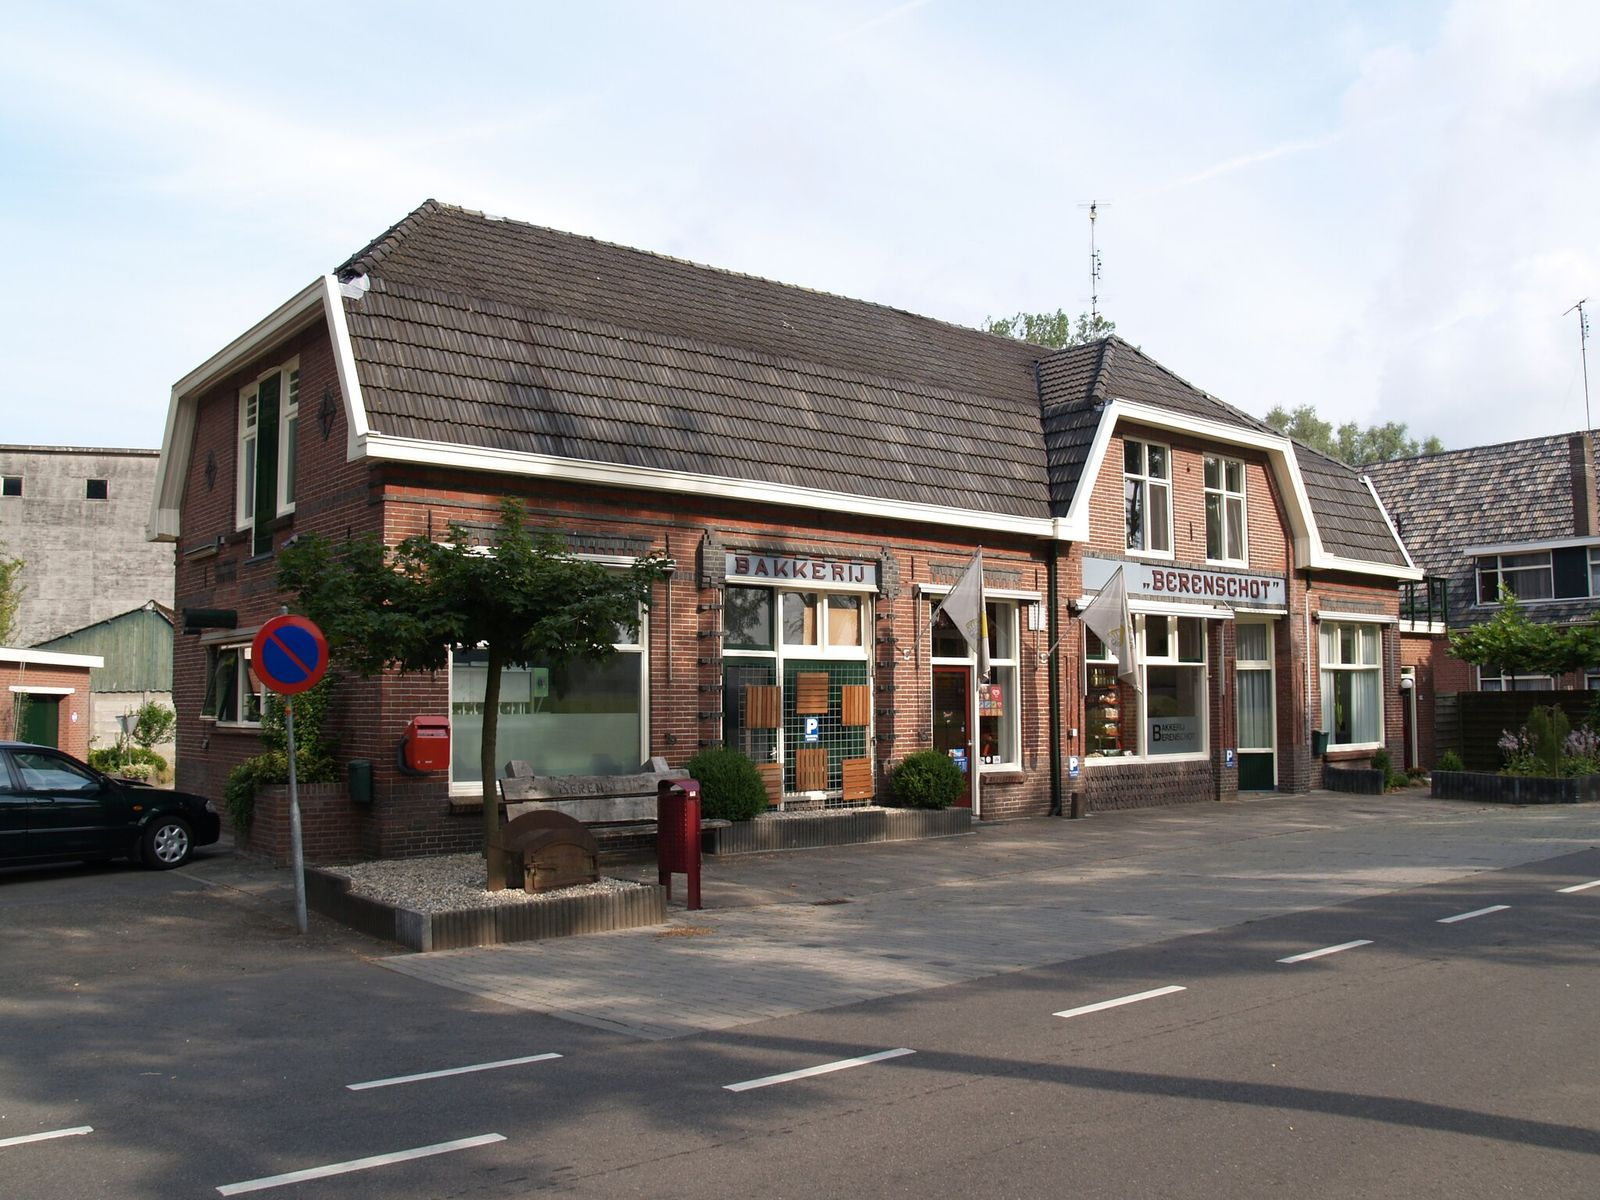 Wooldseweg 70--72, Winterswijk Woold